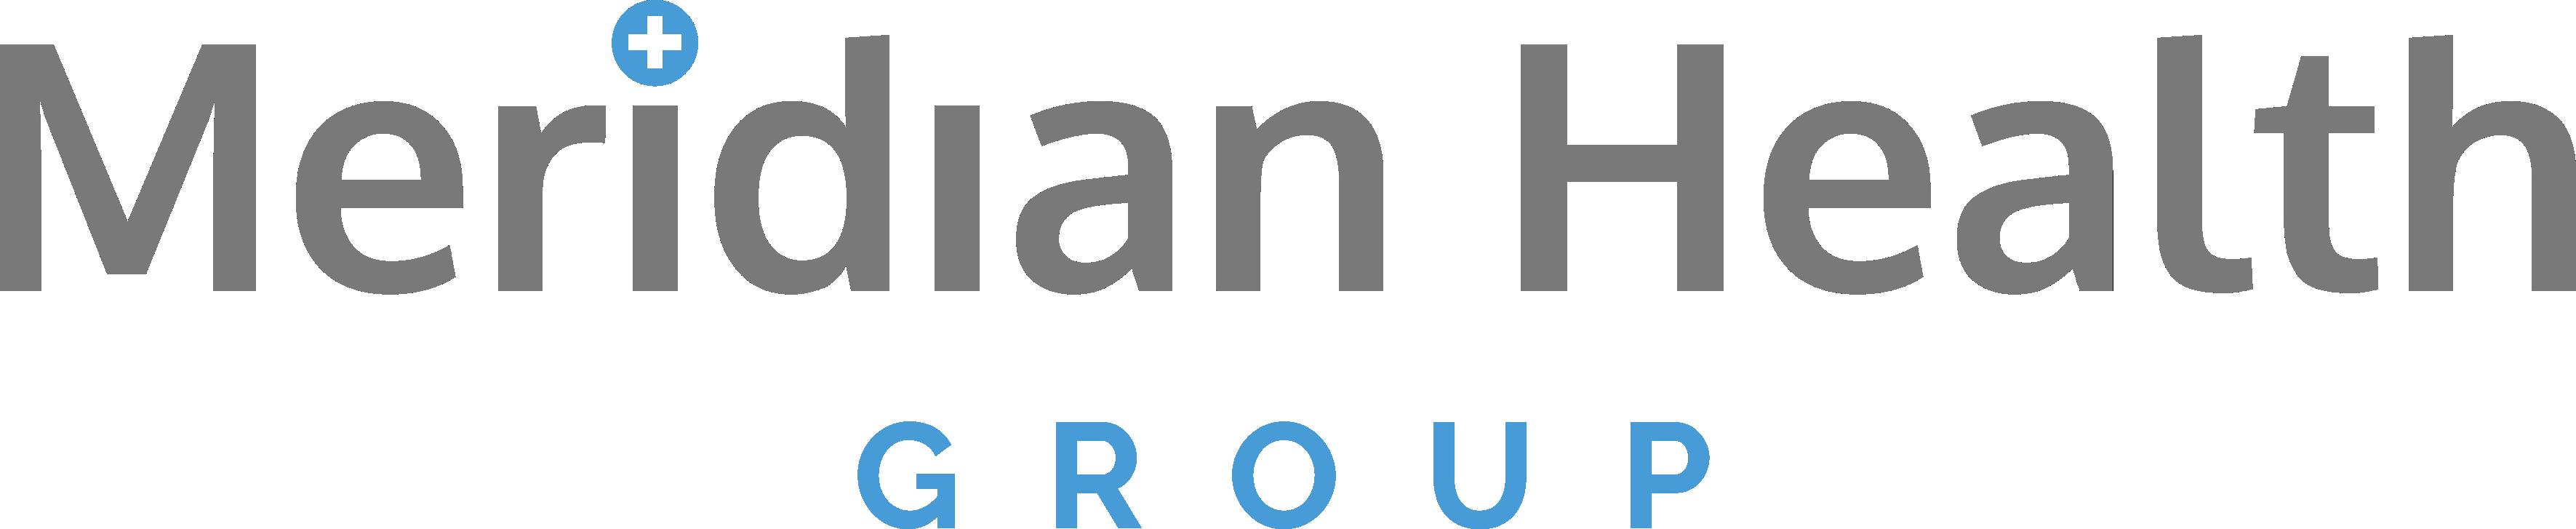 Meridian Health Group